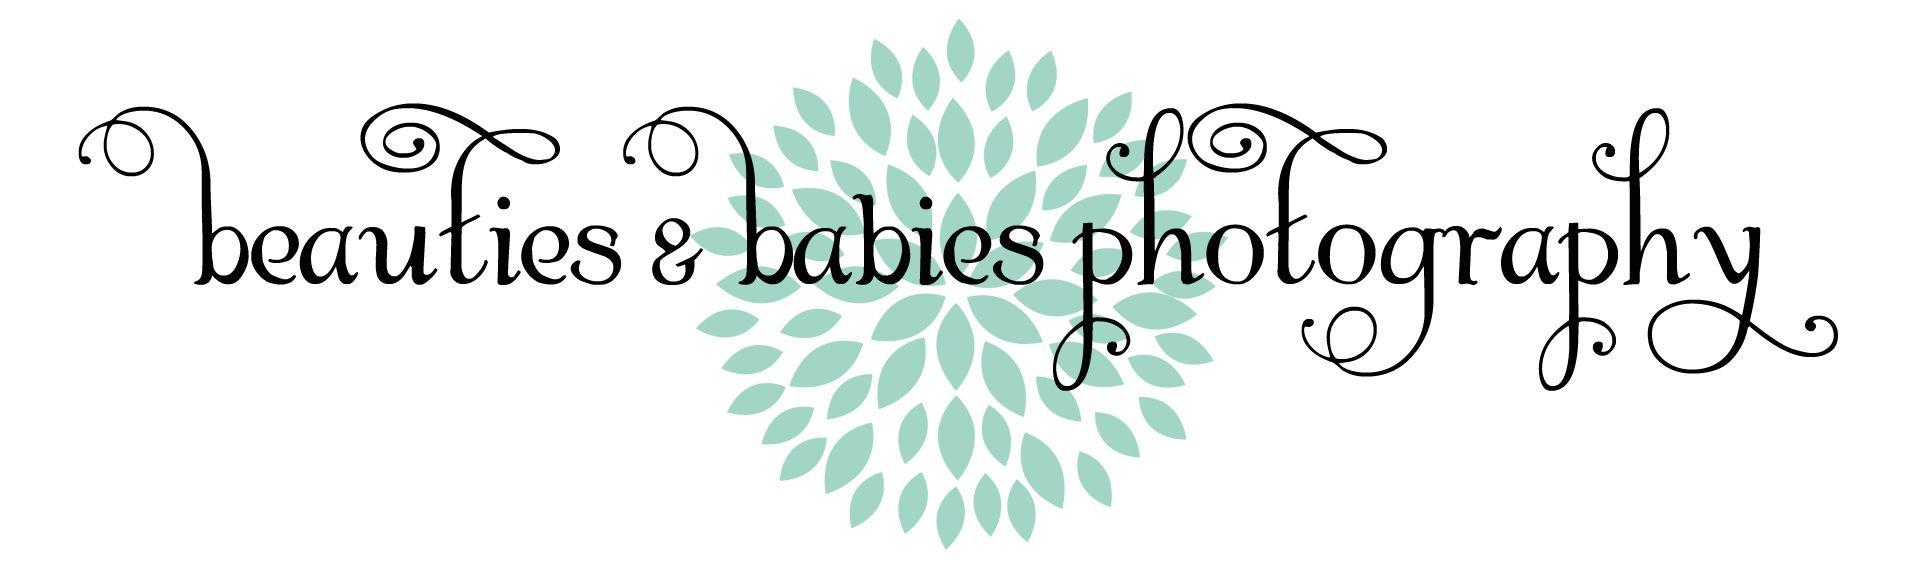 Beauties & Babies Photography